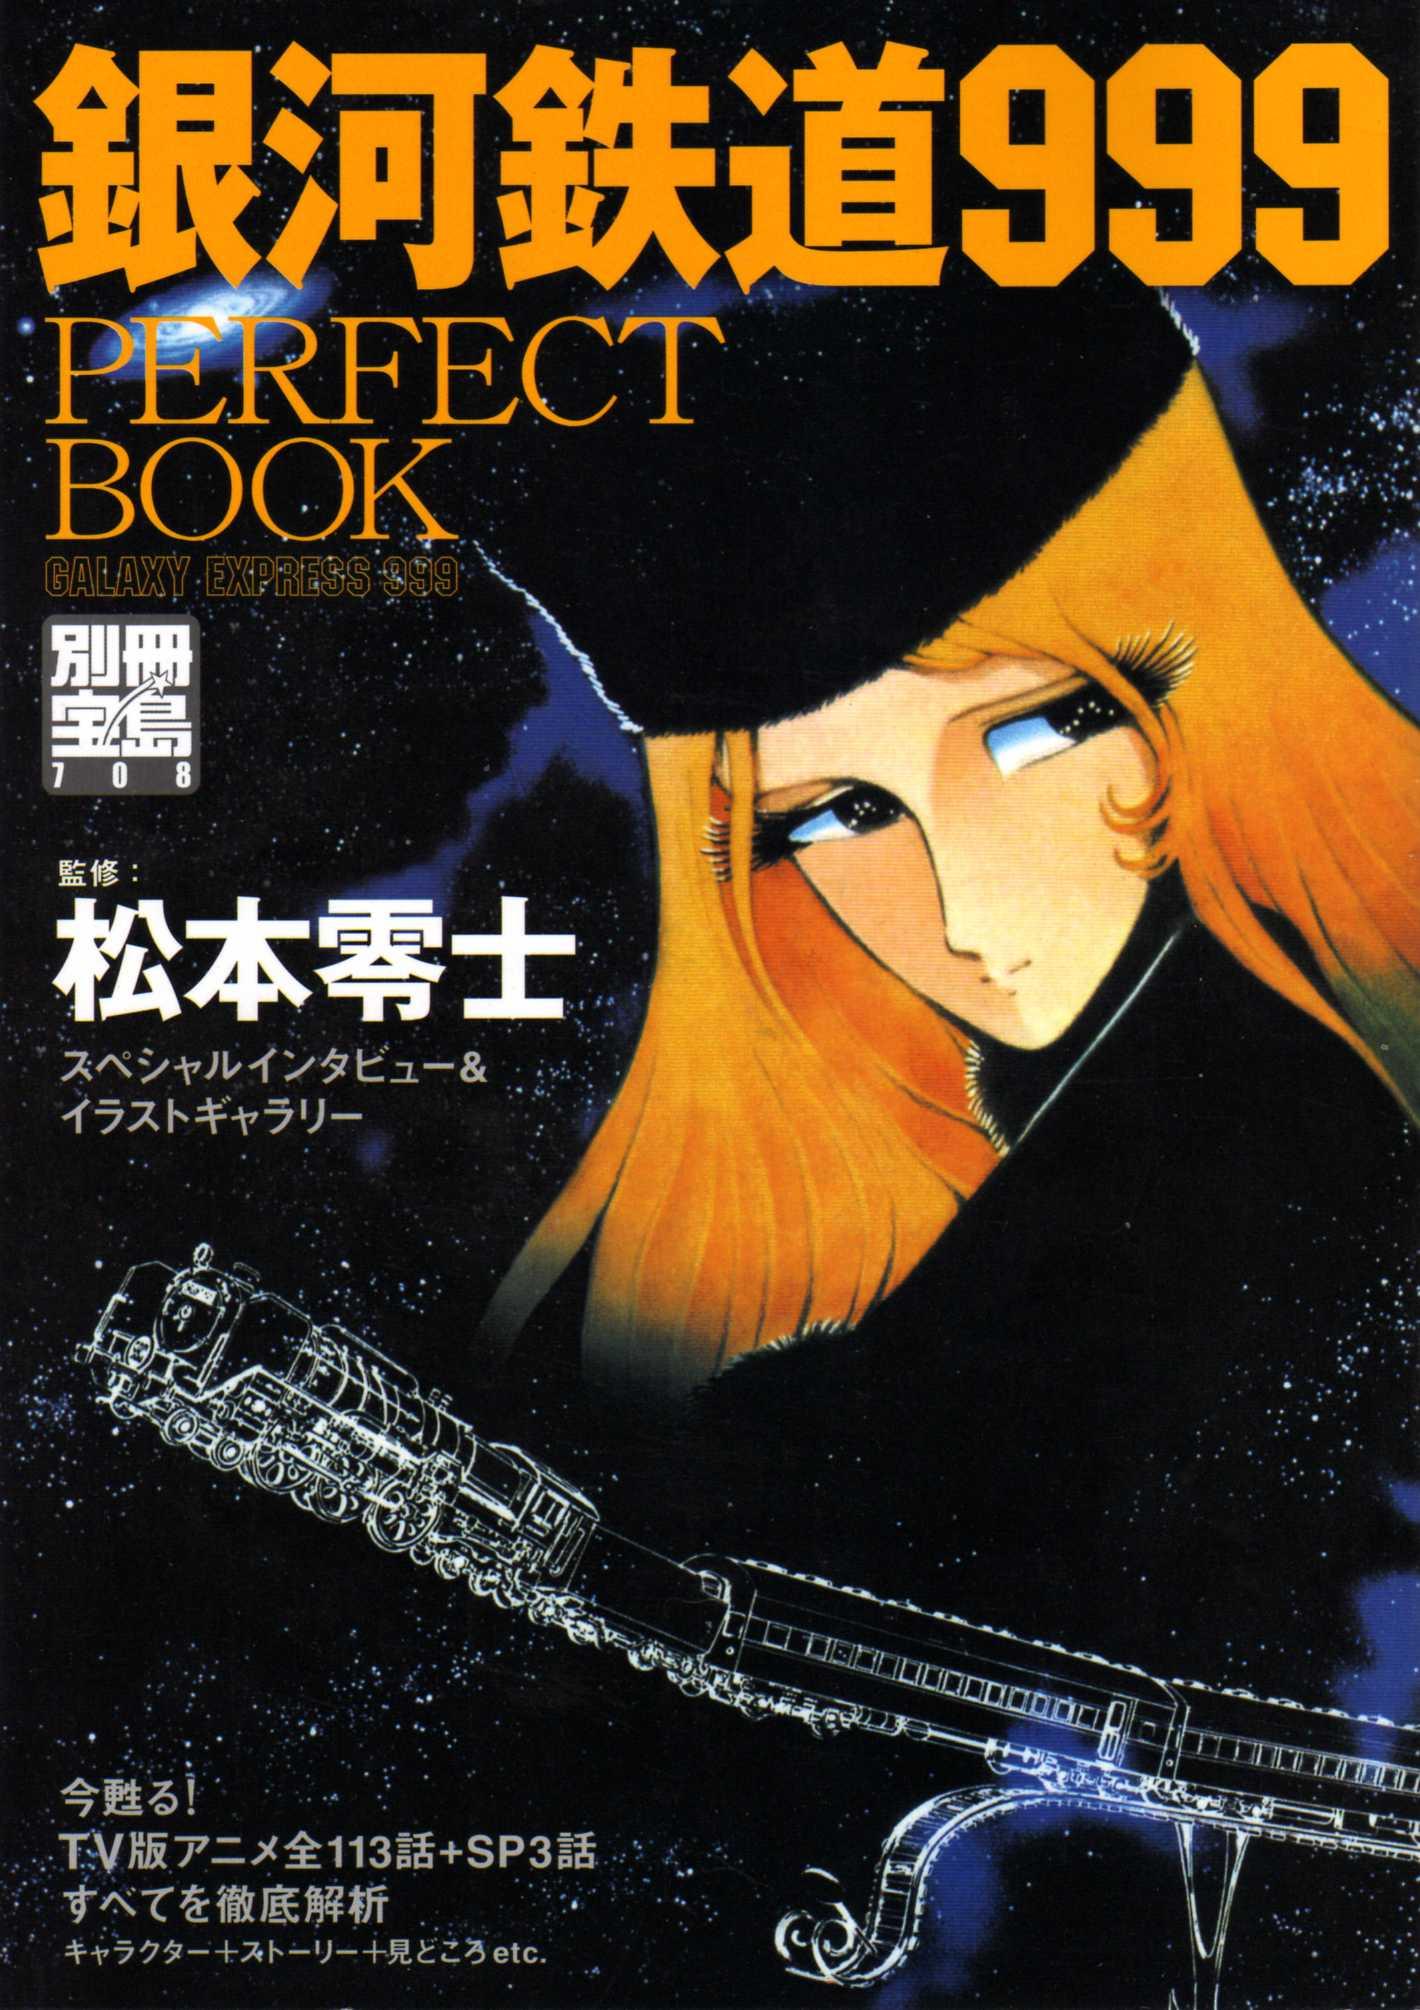 銀河鉄道999 PERFECT BOOK